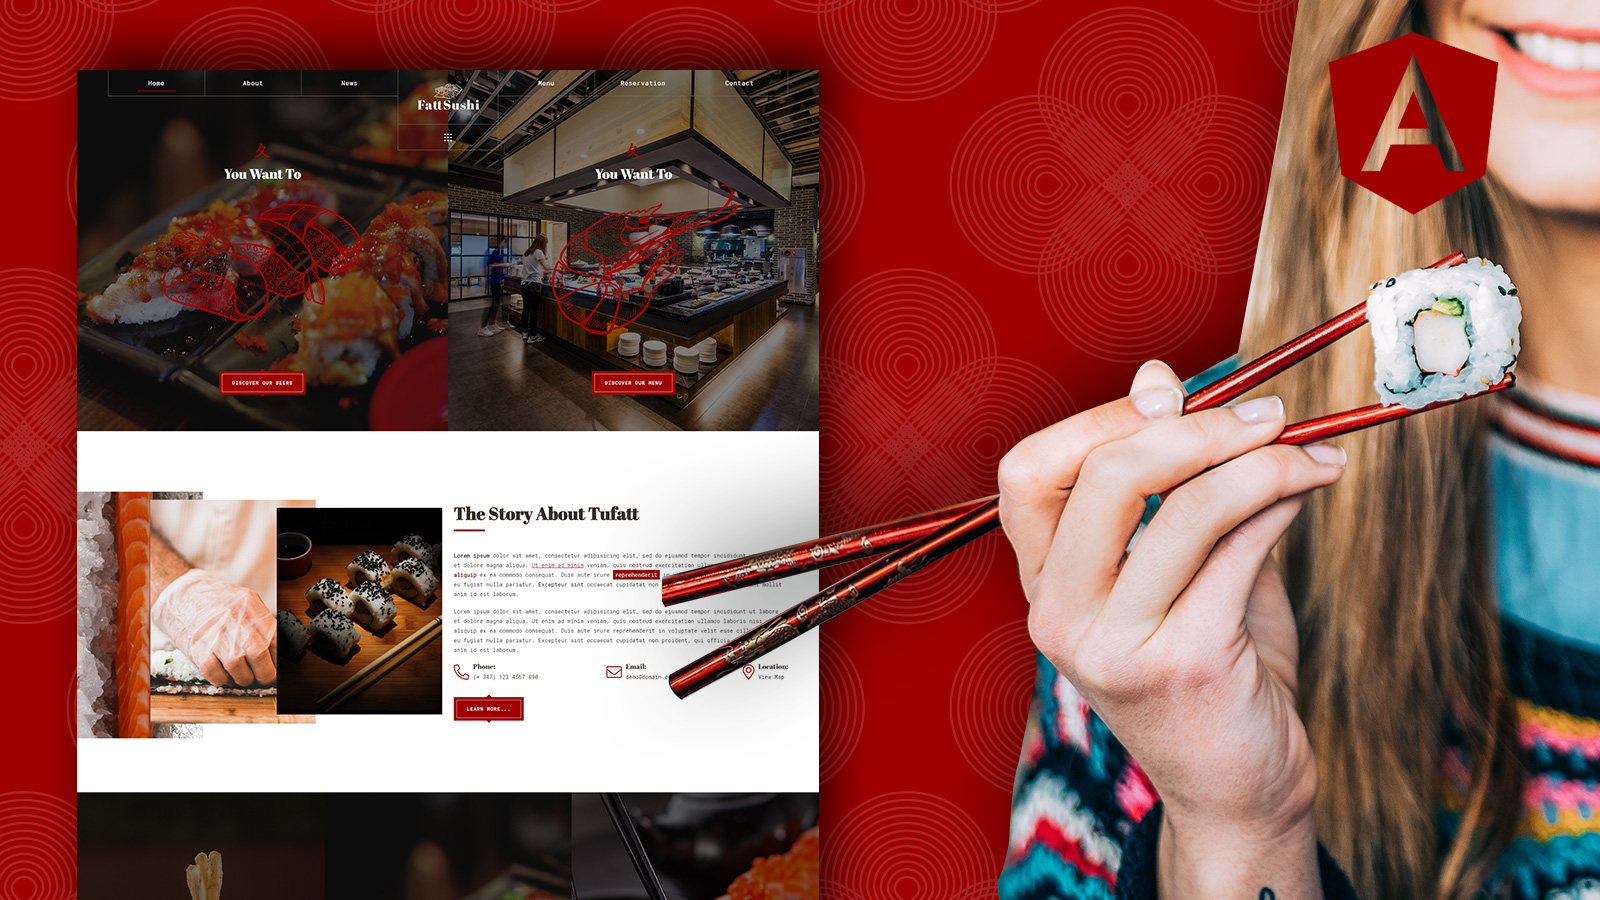 Fattsushi – Japanese Sushi Restaurant Angular JS Template